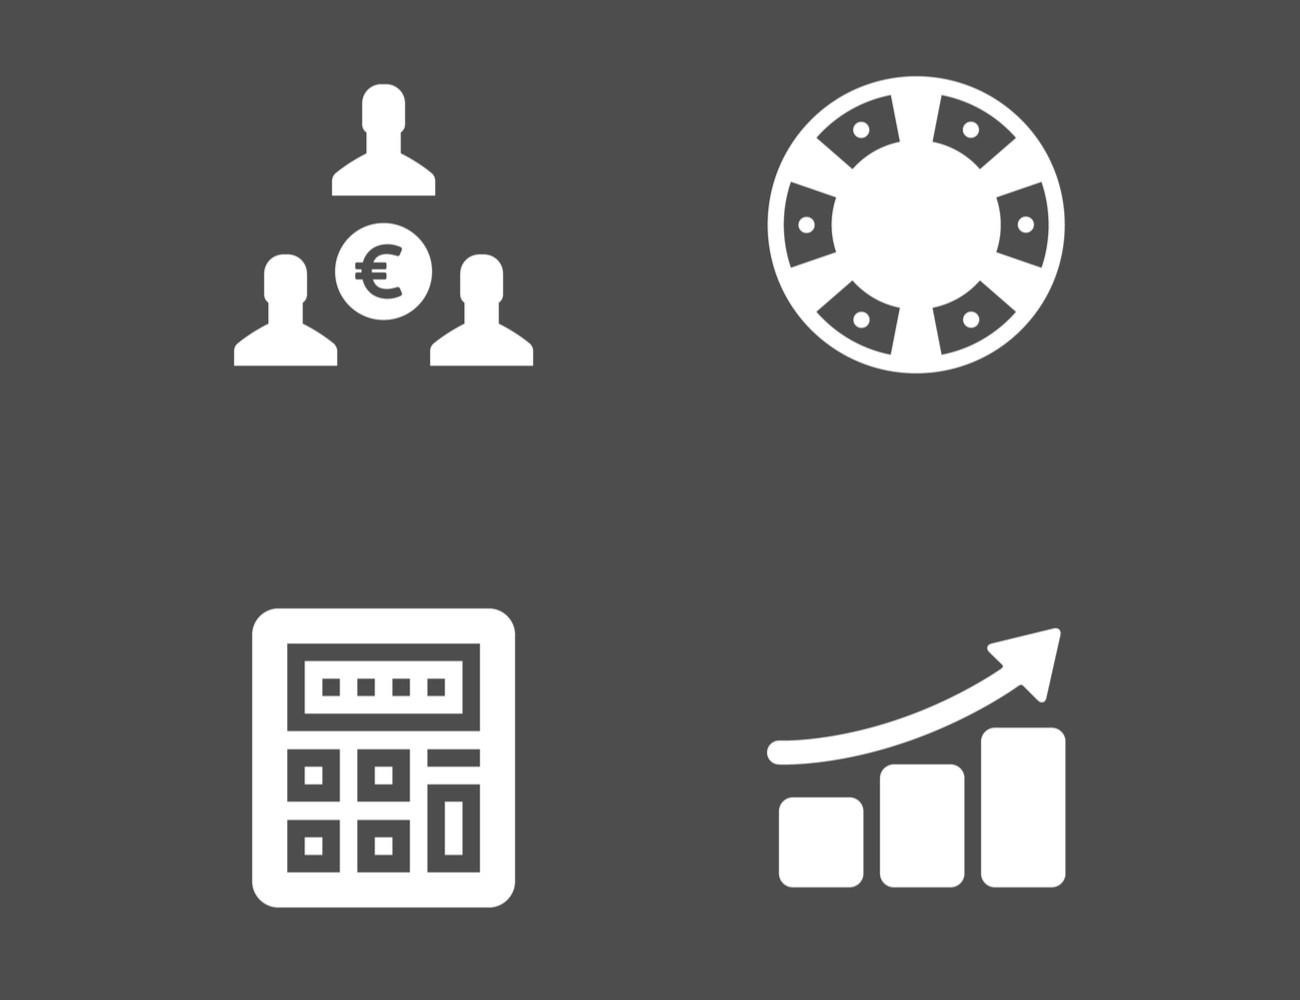 Money icon, poker chip icon, calculator icon and chart icon